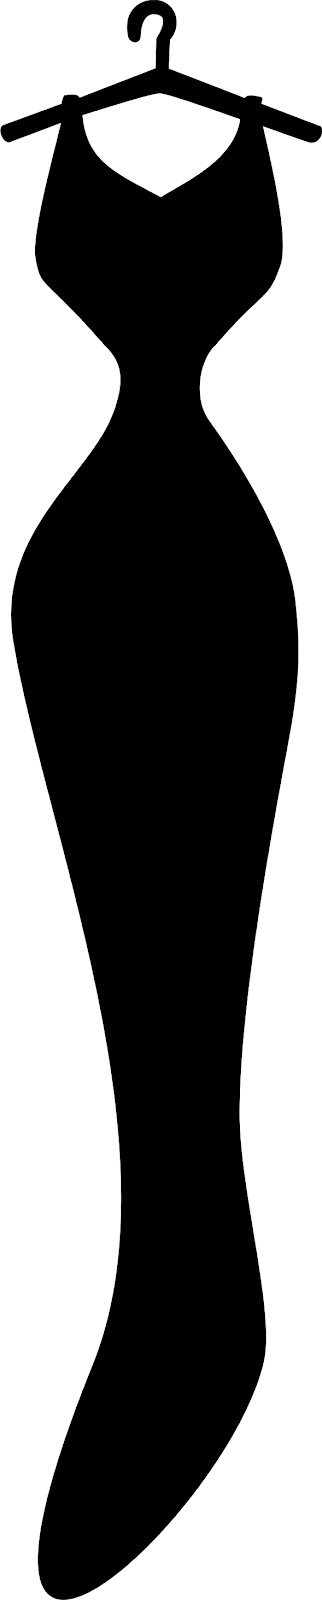 Black Dress svg #14, Download drawings